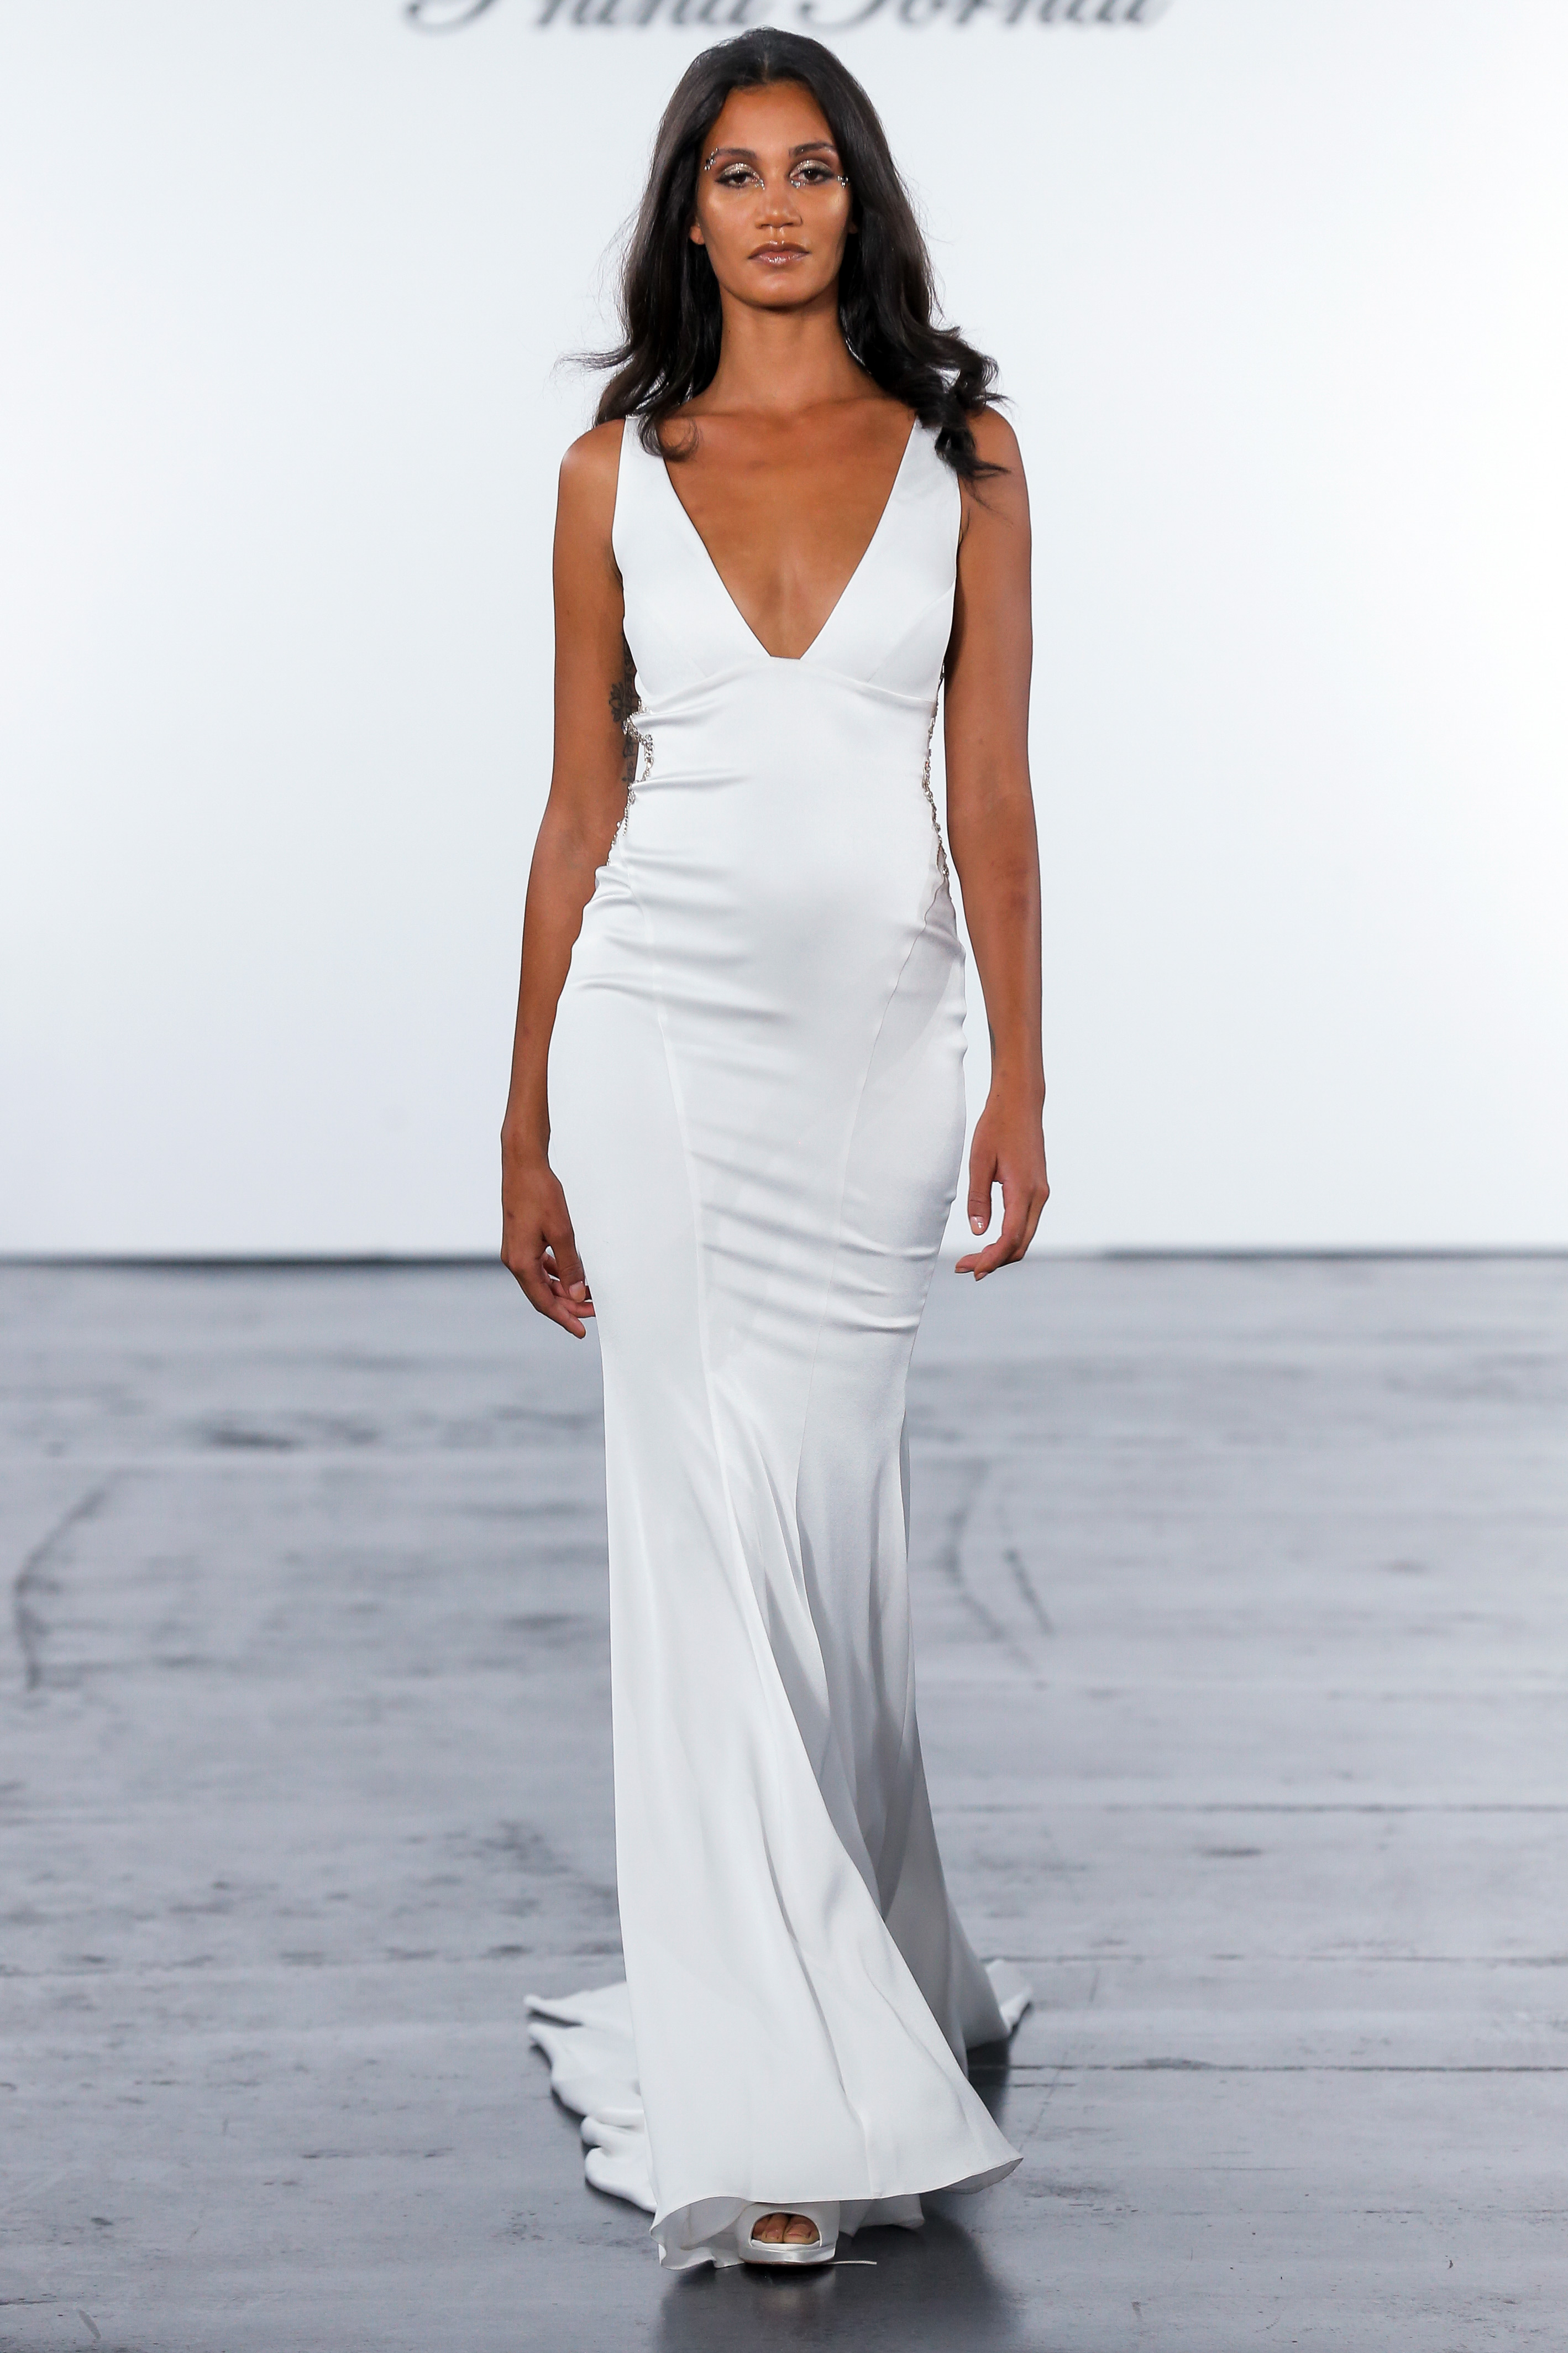 pnina tornai fall 2018 v-neck wedding dress